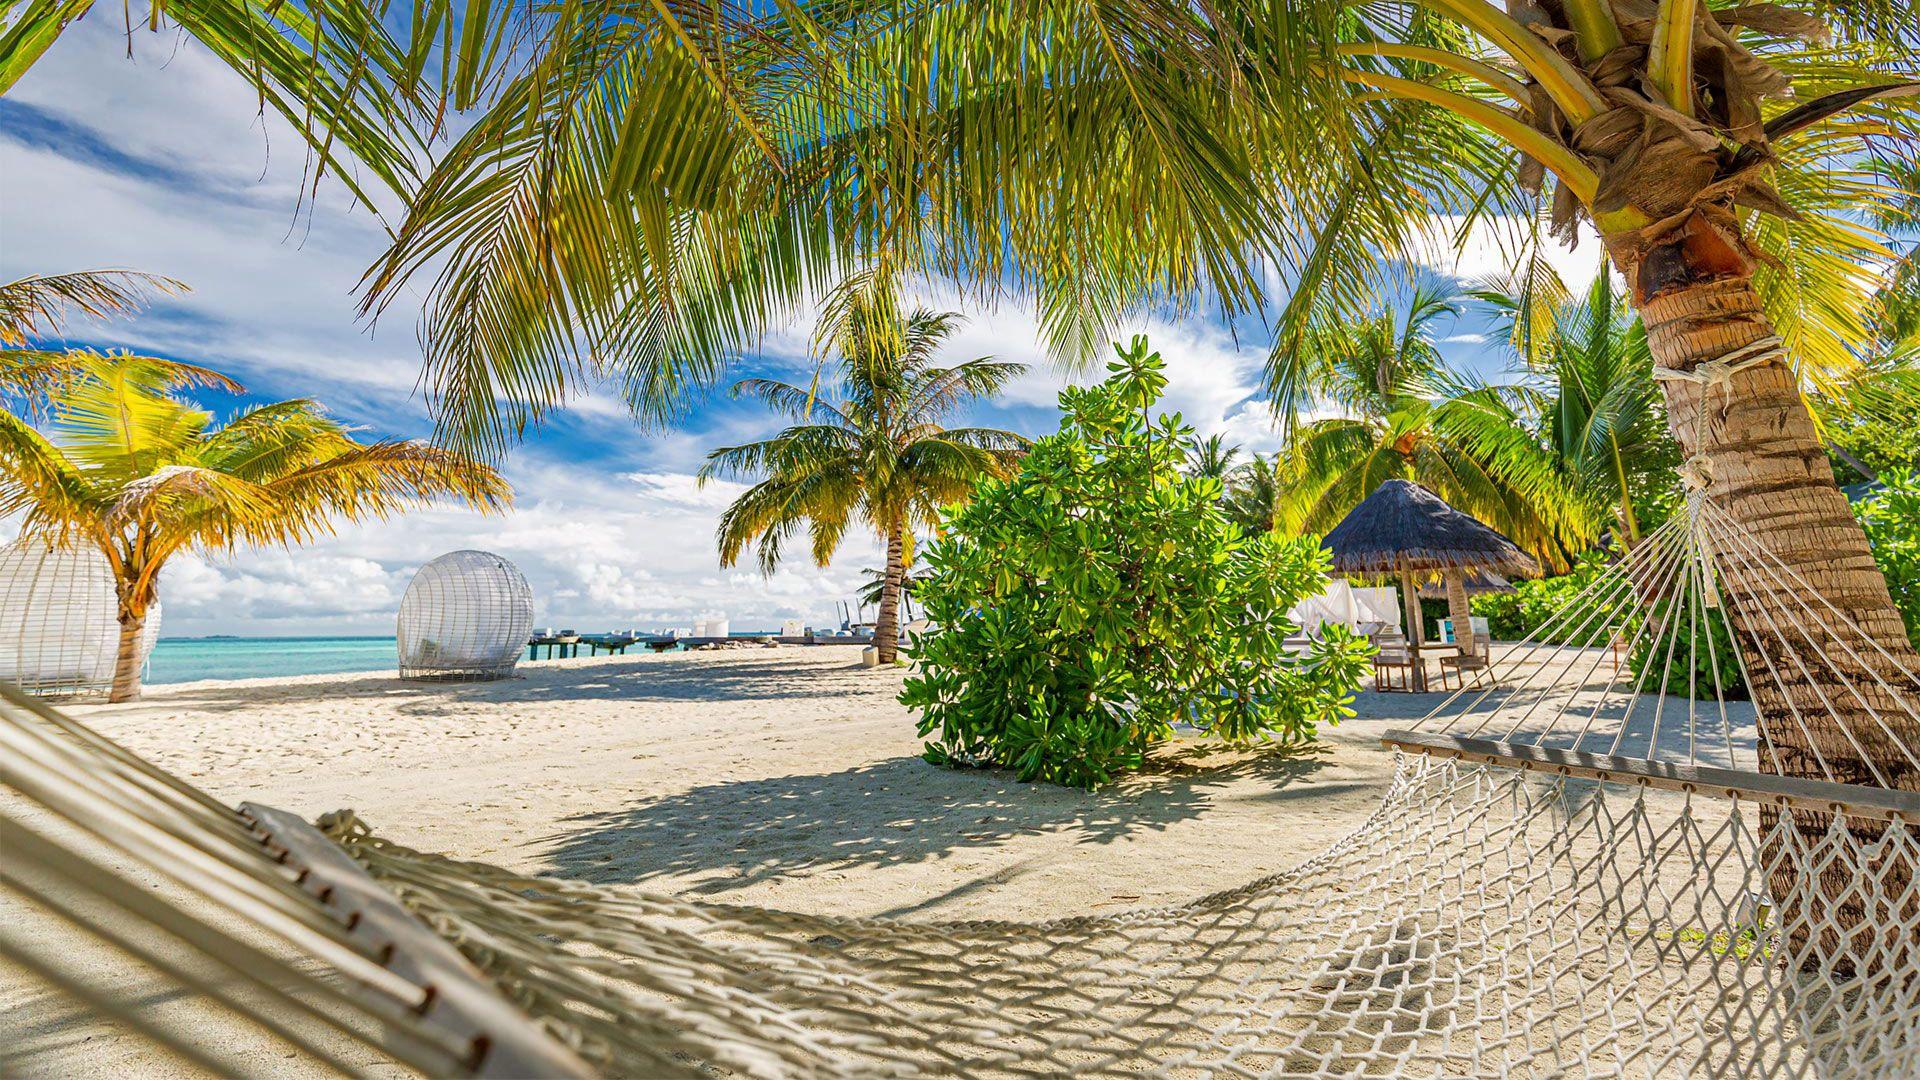 Craciun 2021 - Sejur Charter Maldive, 10 zile